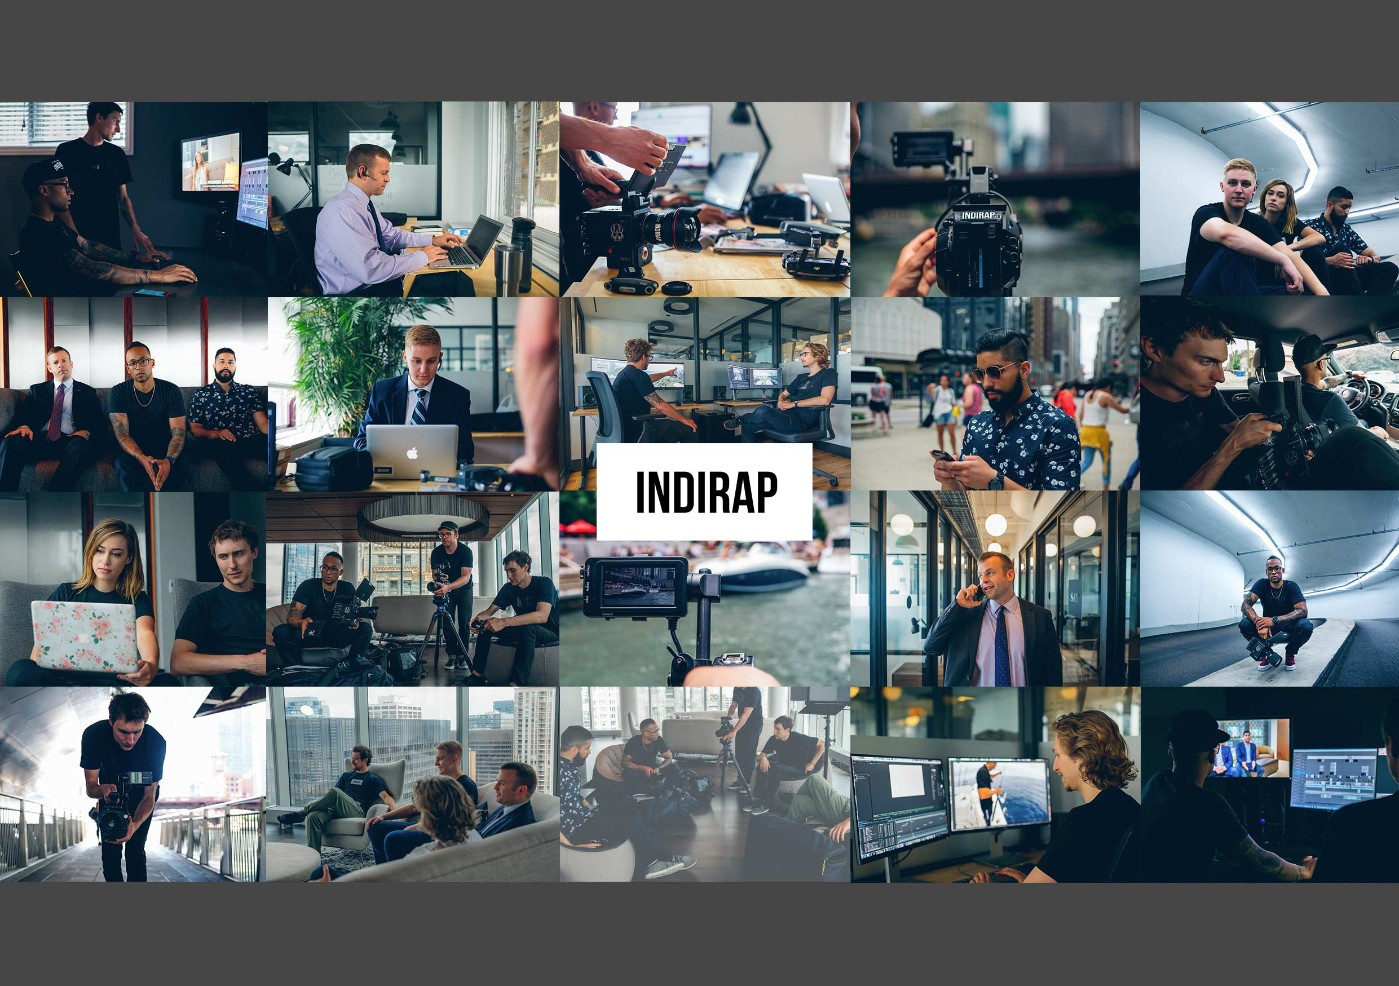 Indirap Productions - Indirap Productions